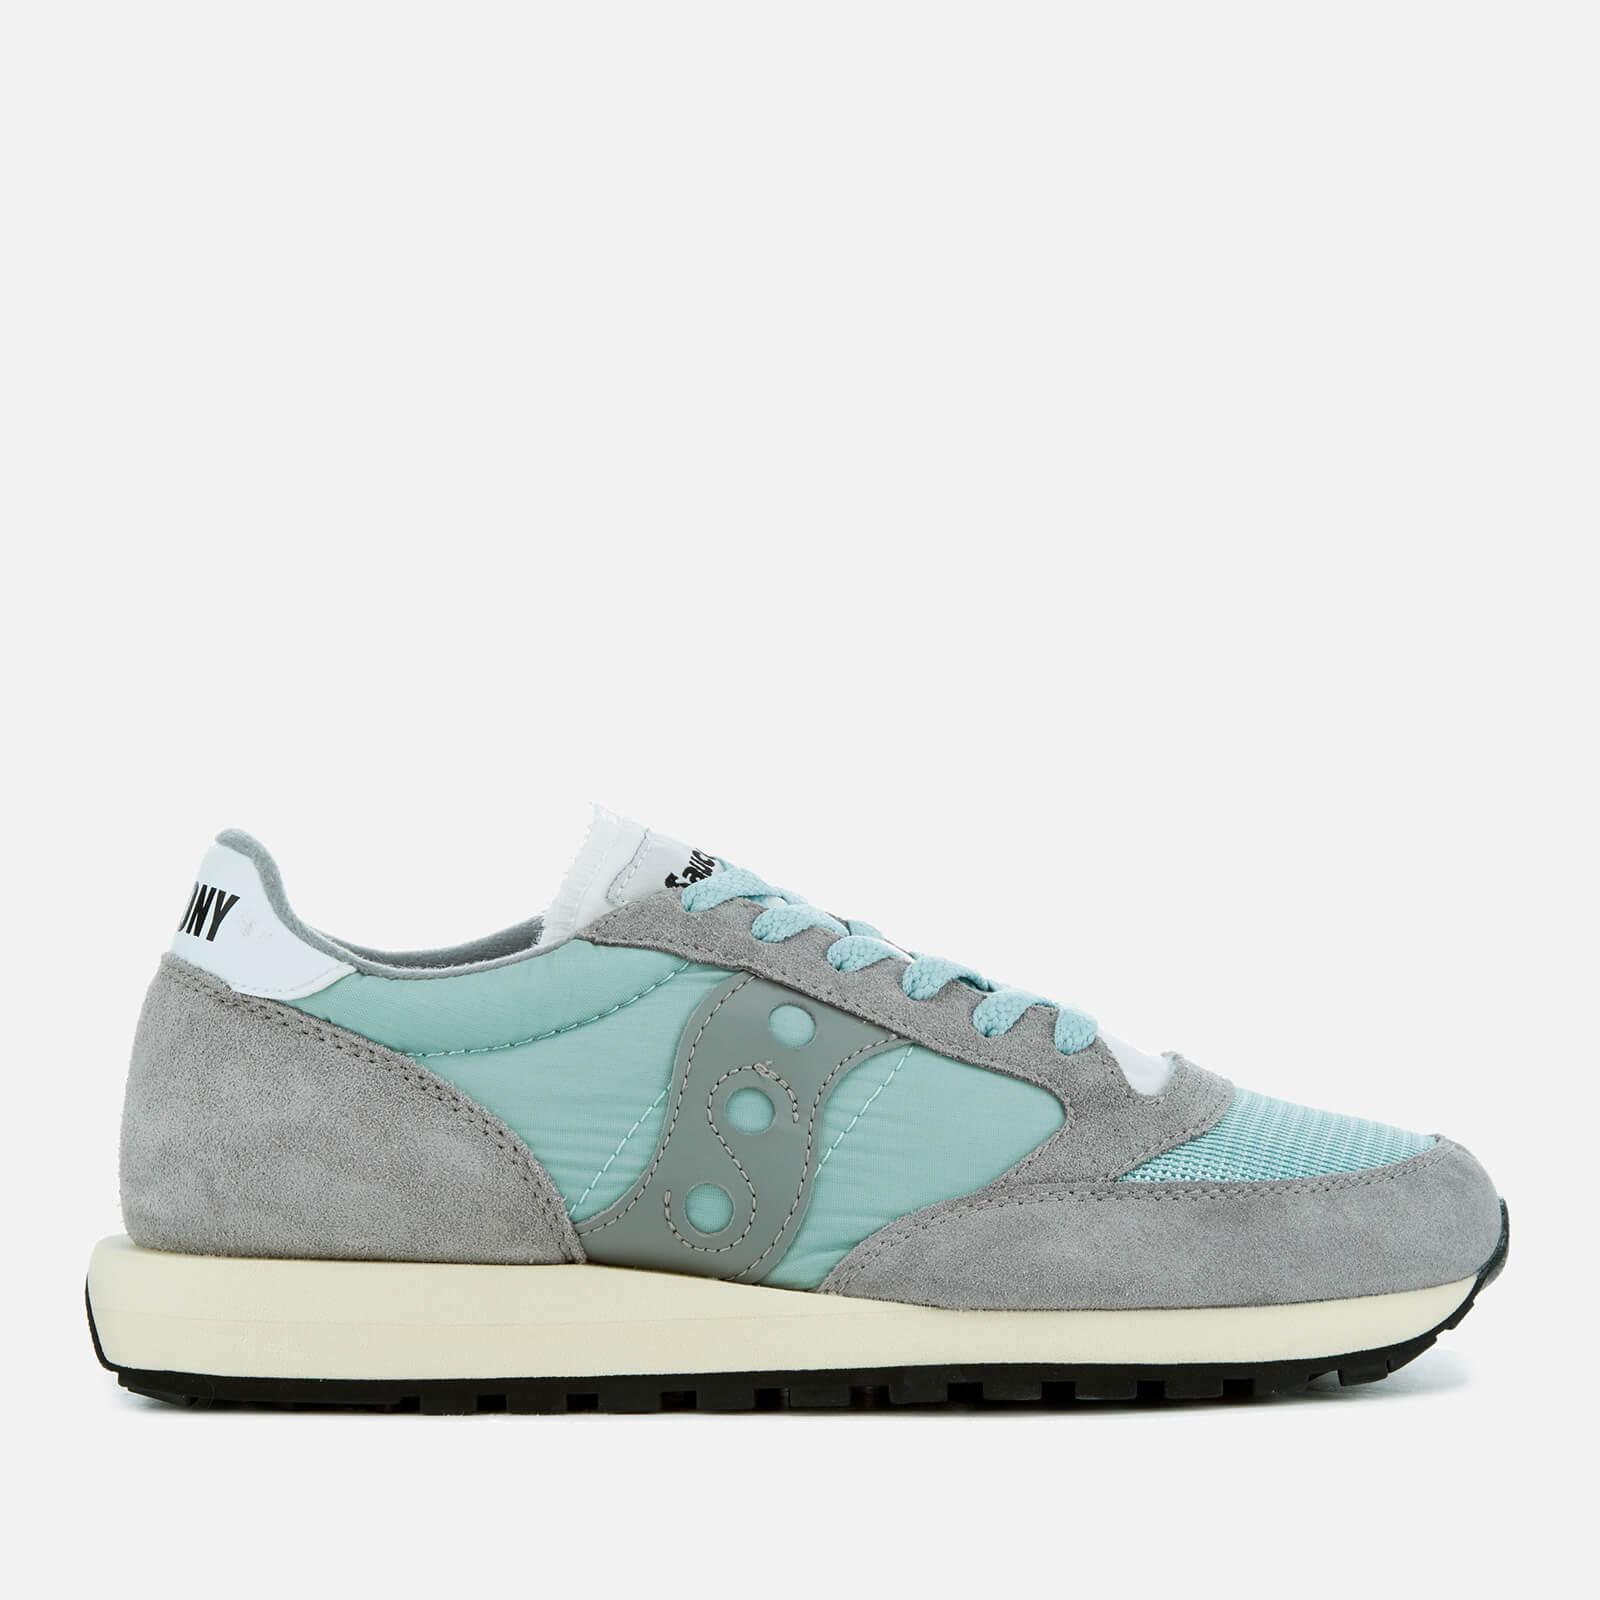 a5330583333e Saucony Jazz Original Vintage Trainers - Vintage Grey White Mens Footwear